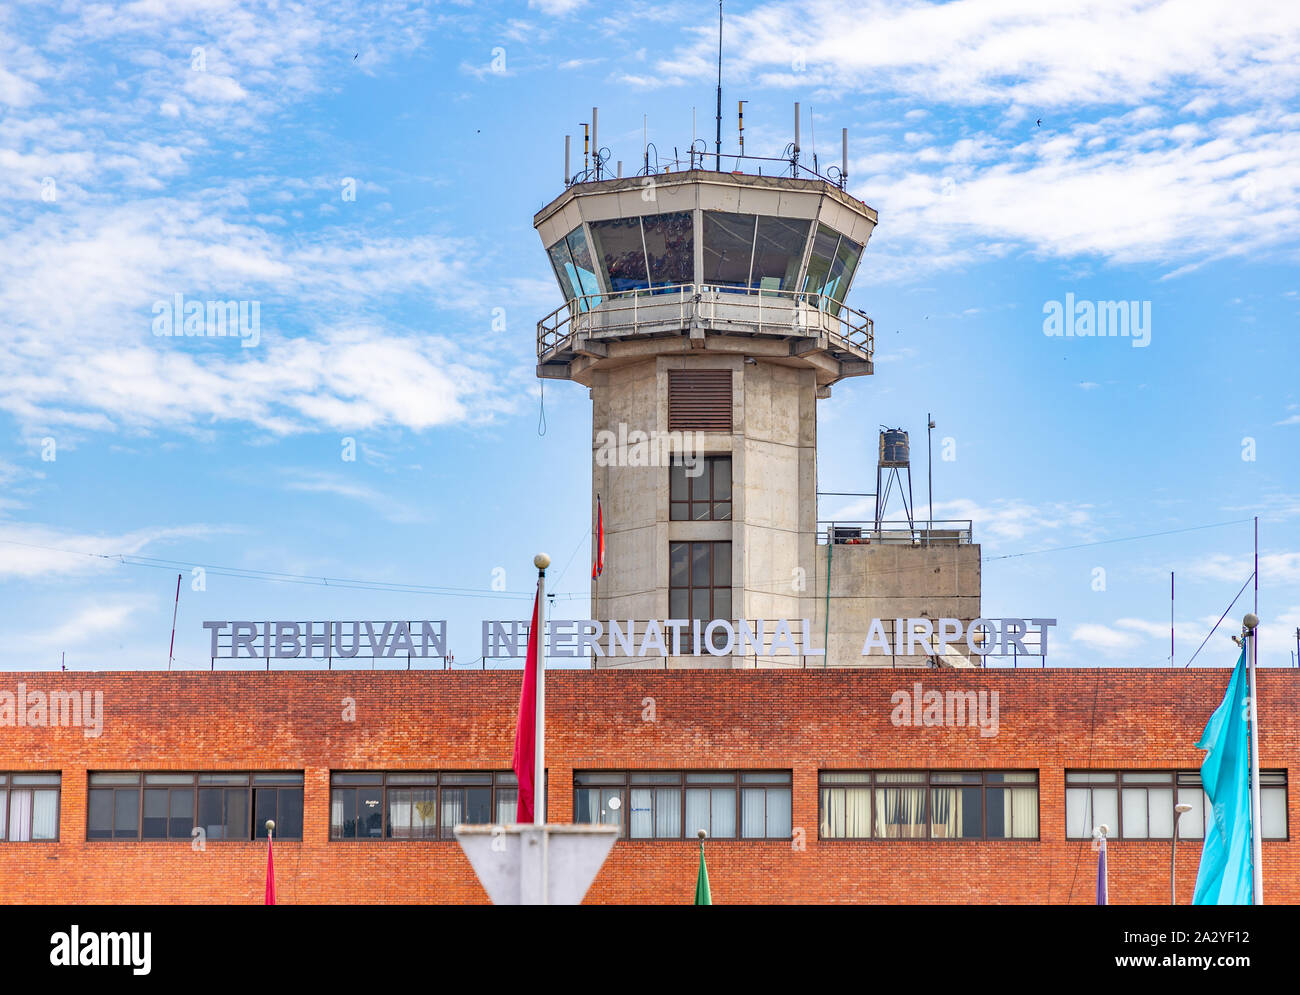 El Aeropuerto Internacional de Tribhuvan en Katmandú, Nepal. Foto de stock